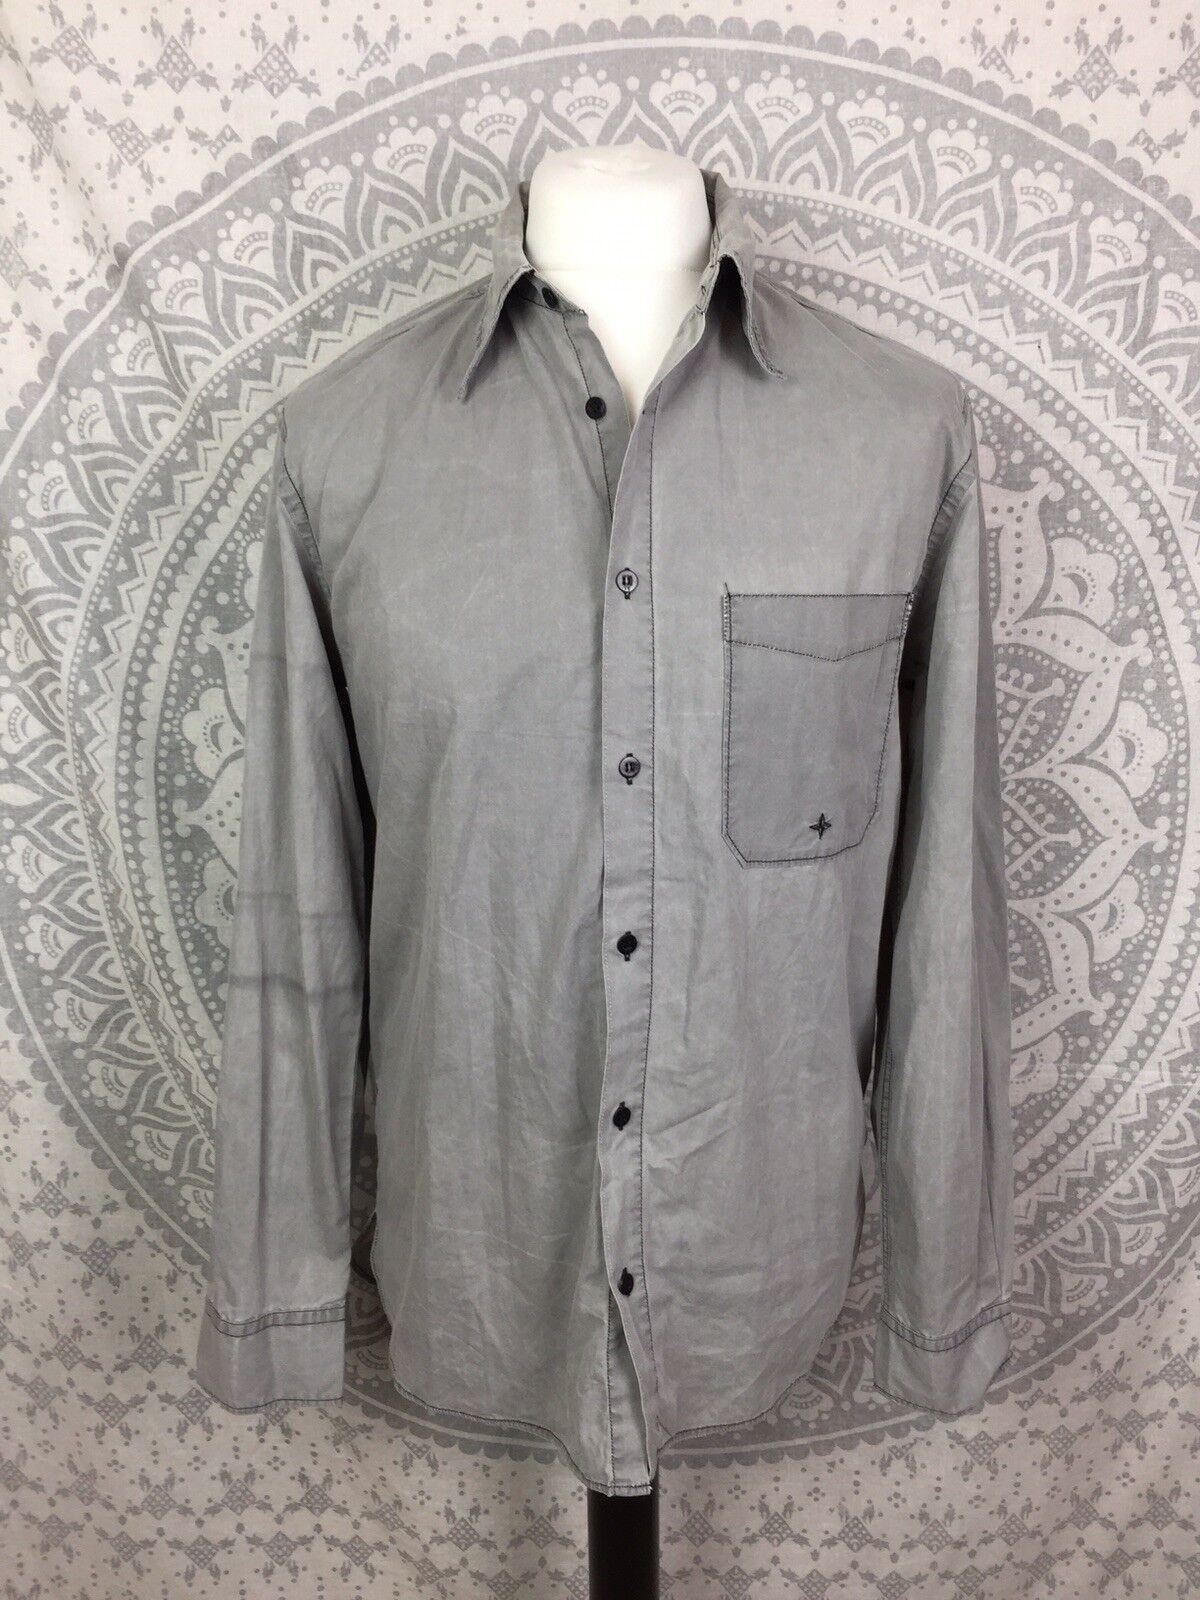 Vintage Stone Island Long Sleeve Shirt Casuals Retro Light Grey Medium M Mens